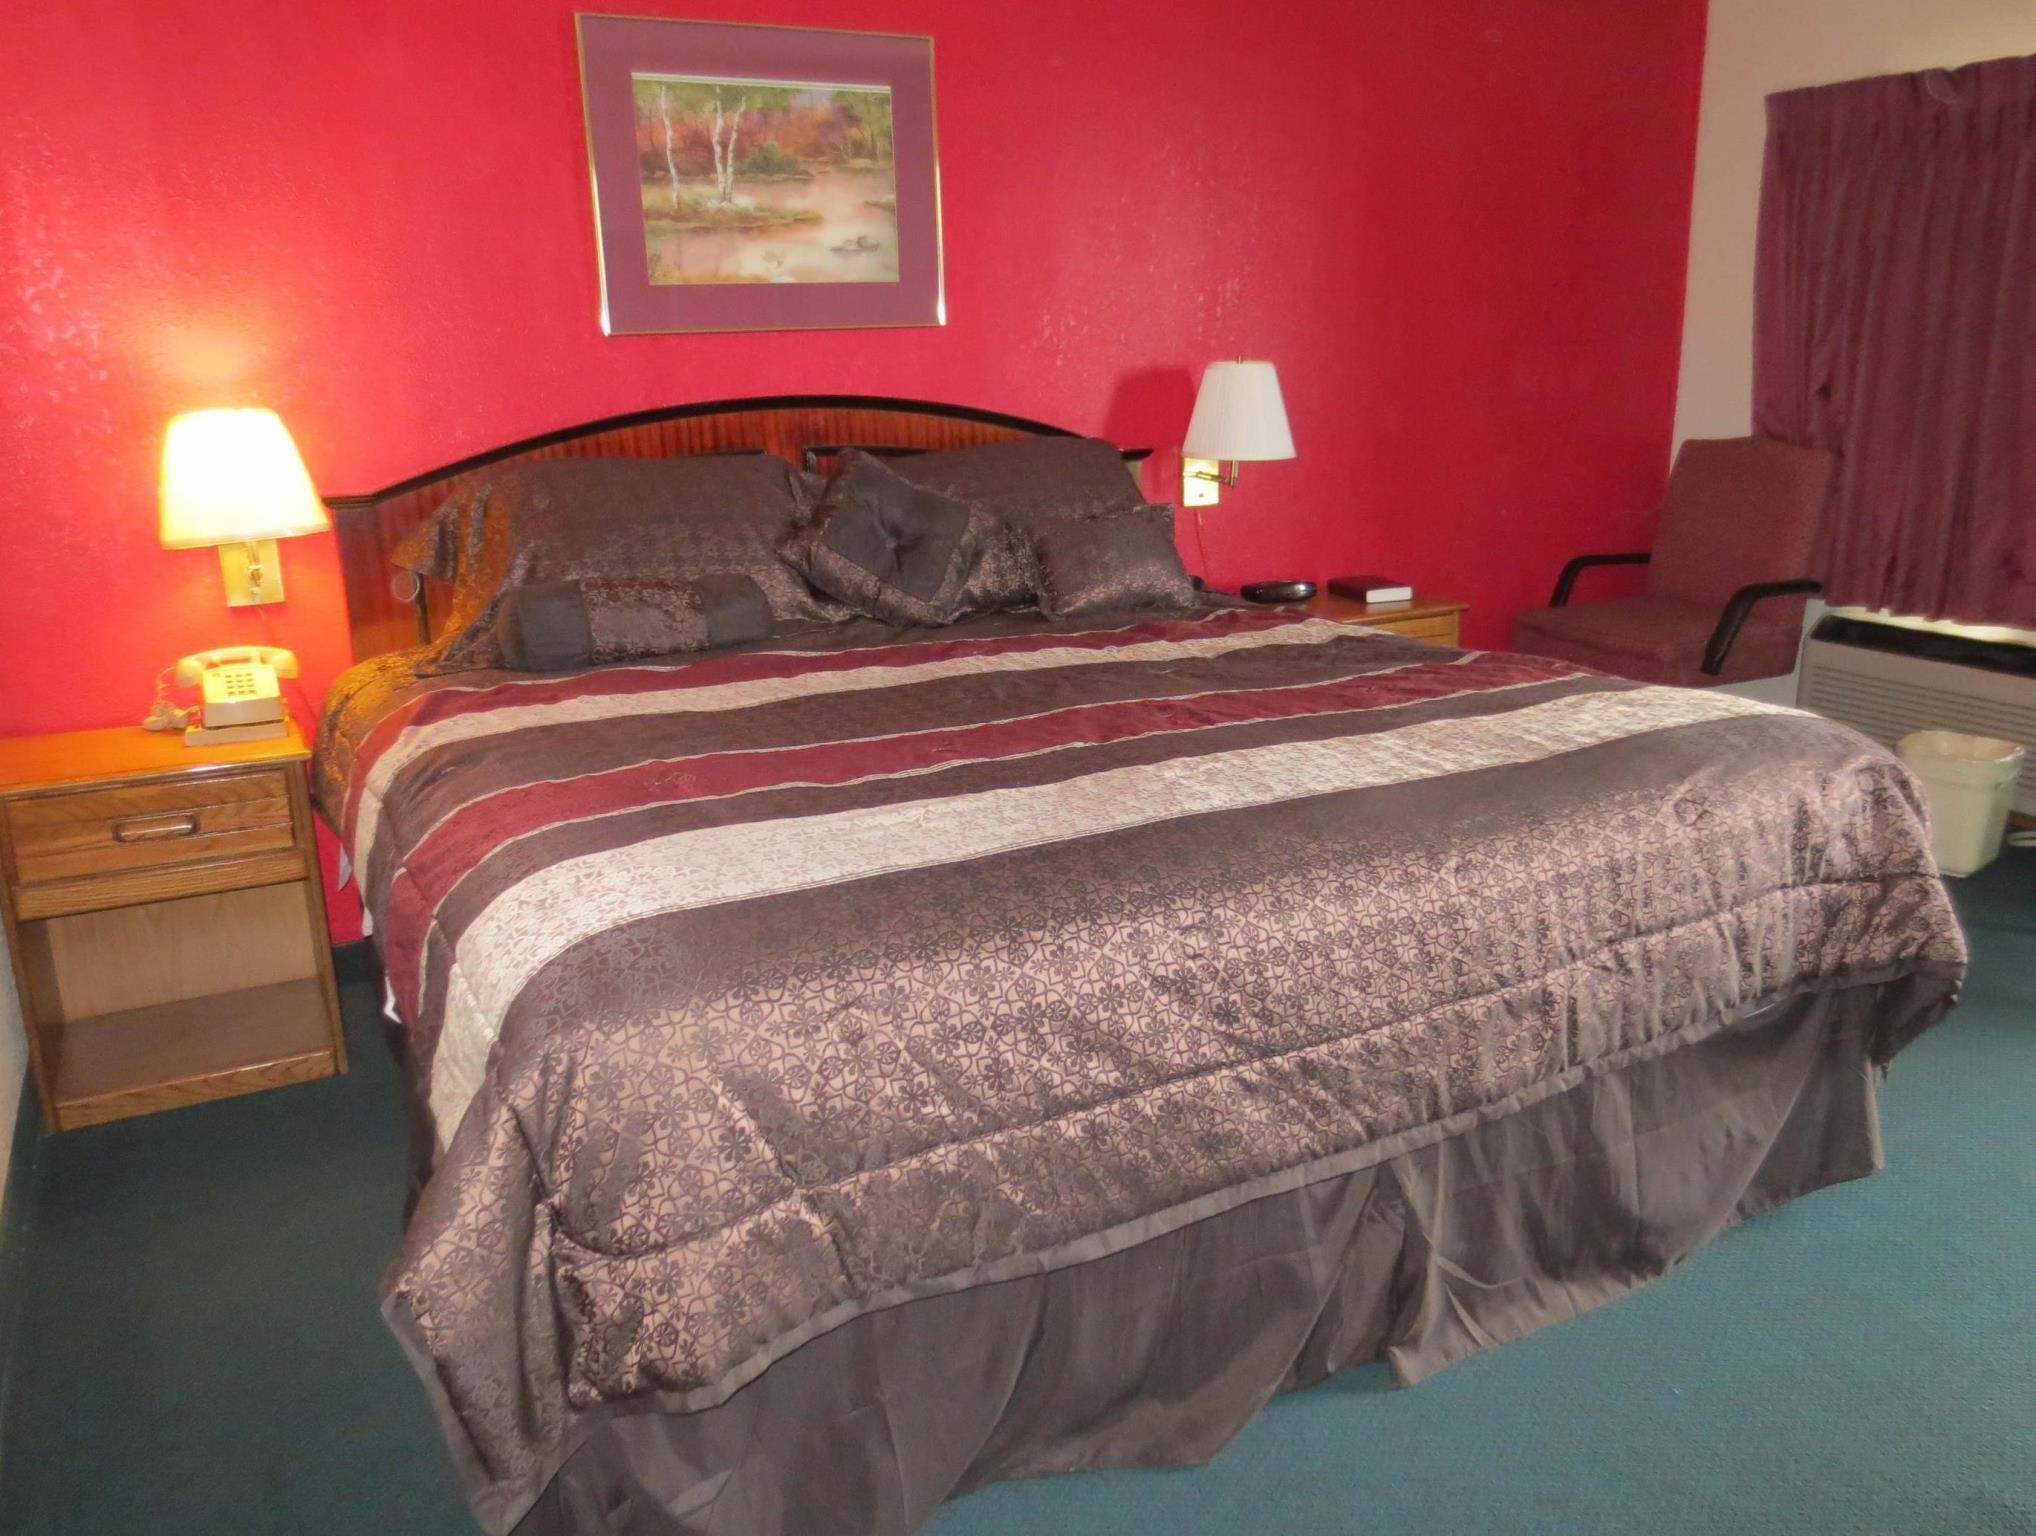 America's Best Inn and Suites - Emporia, Lyon